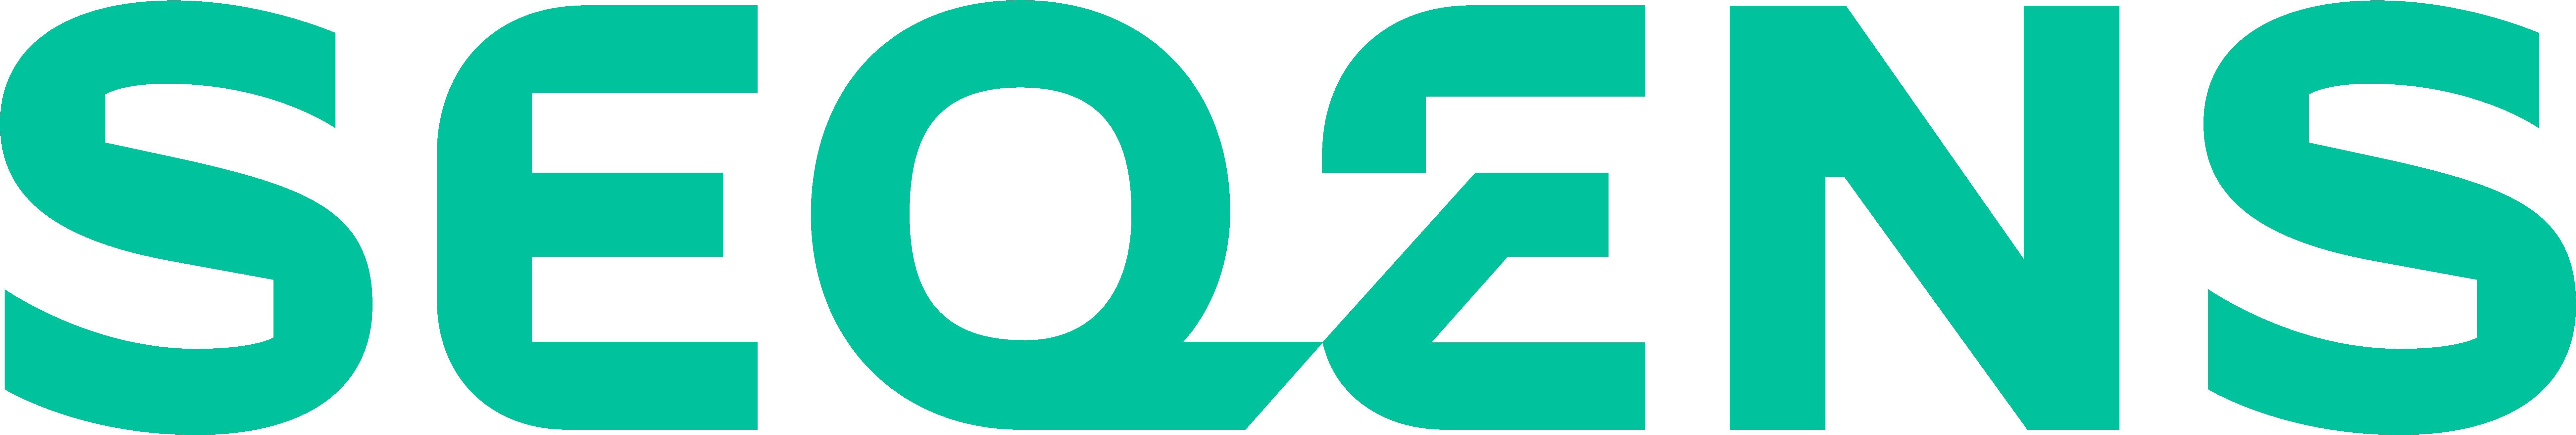 H2B (GROUPE SEQENS)